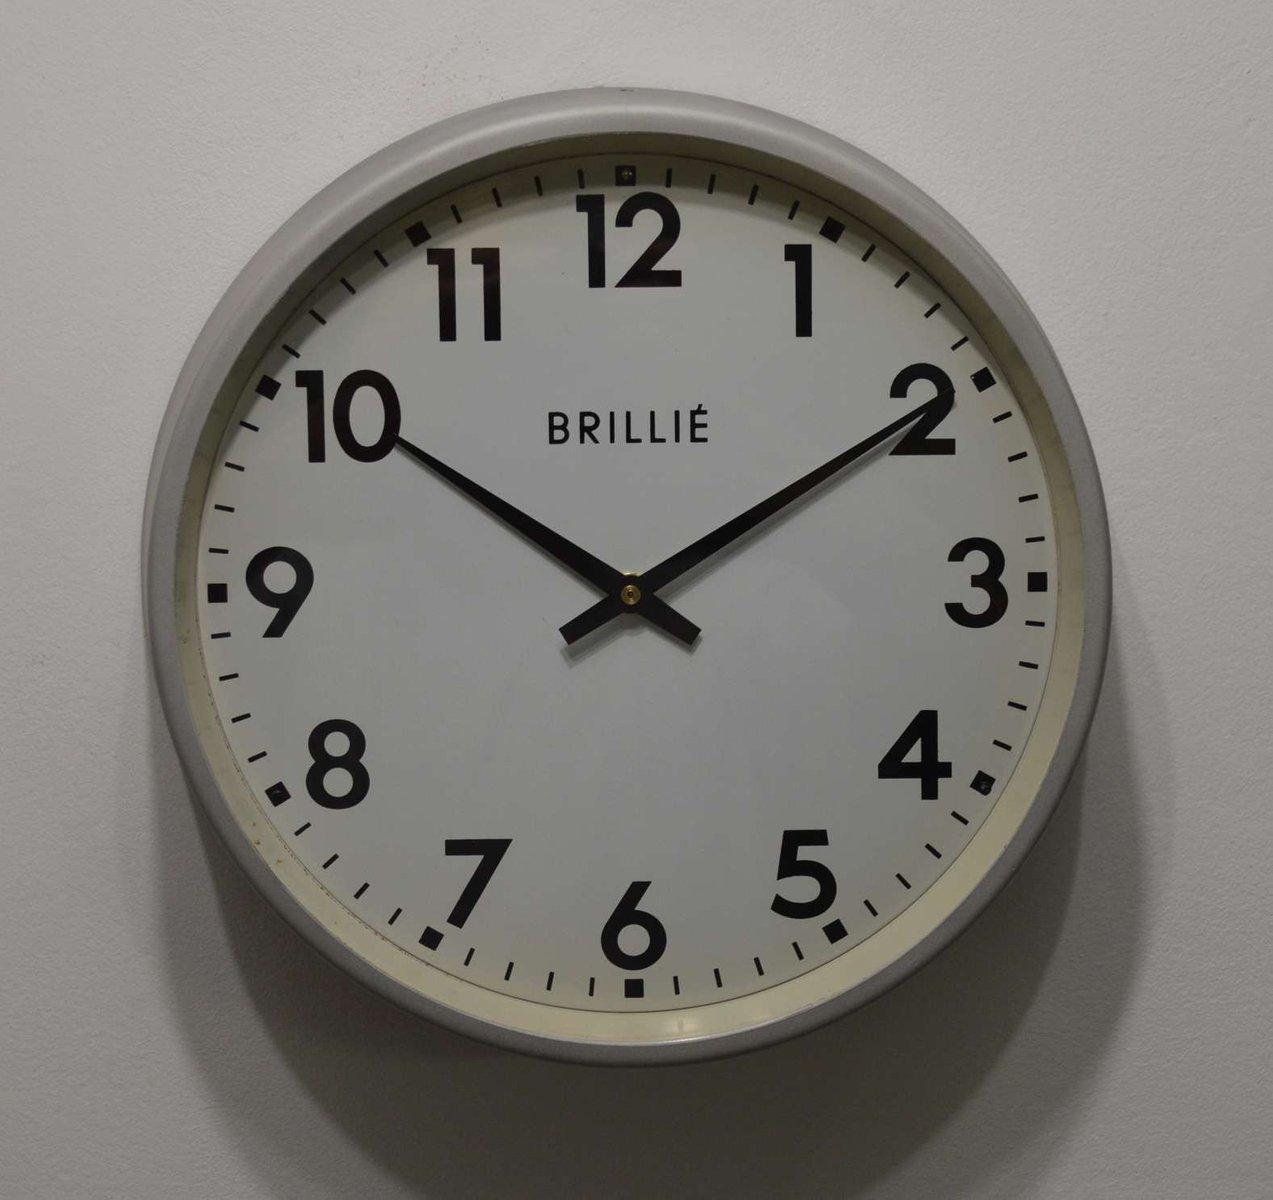 Horloge de brilli france en vente sur pamono for Prix horloge